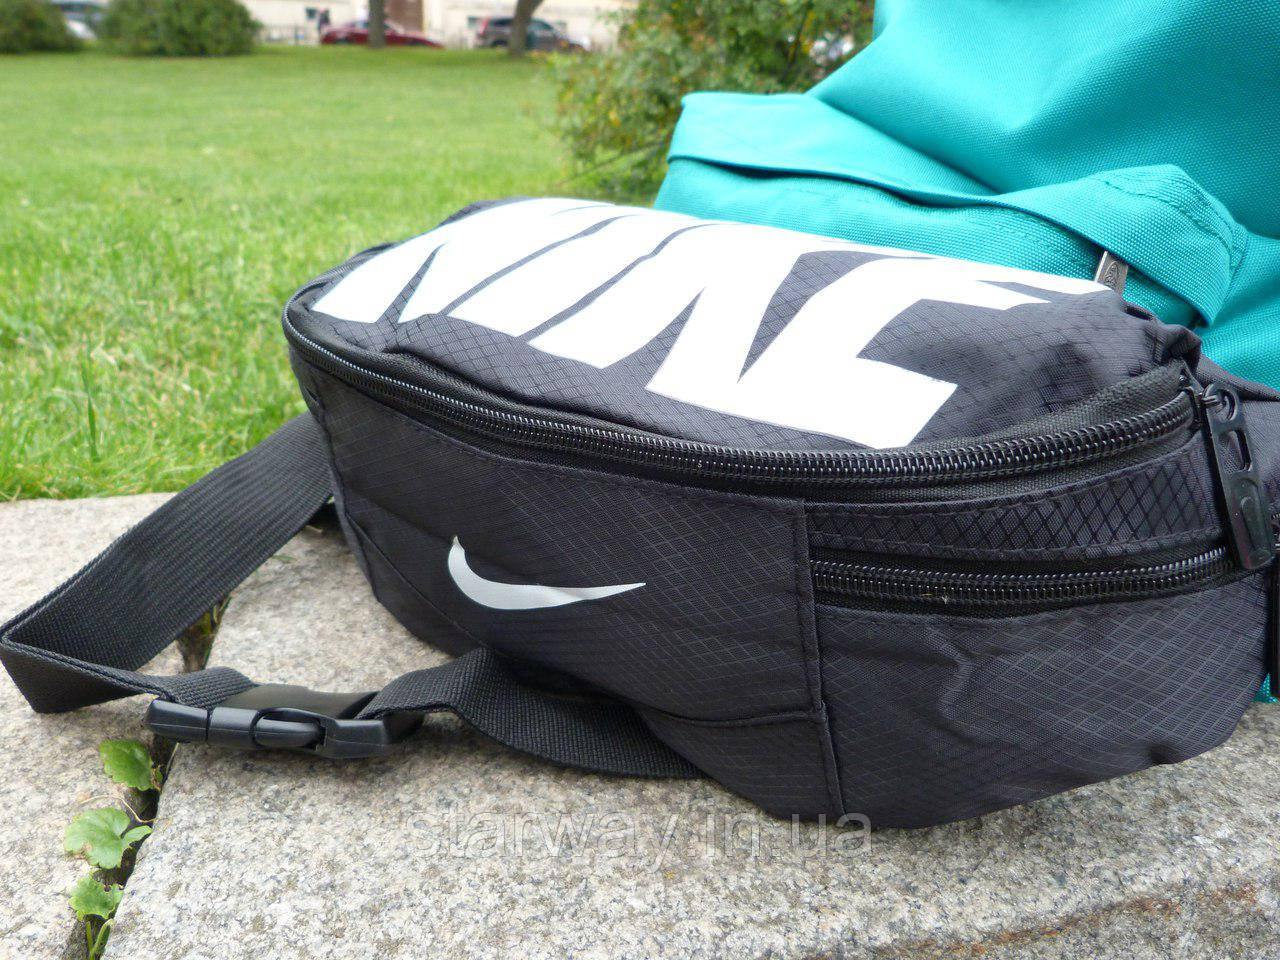 Бананка Nike лого | Сумка стильная